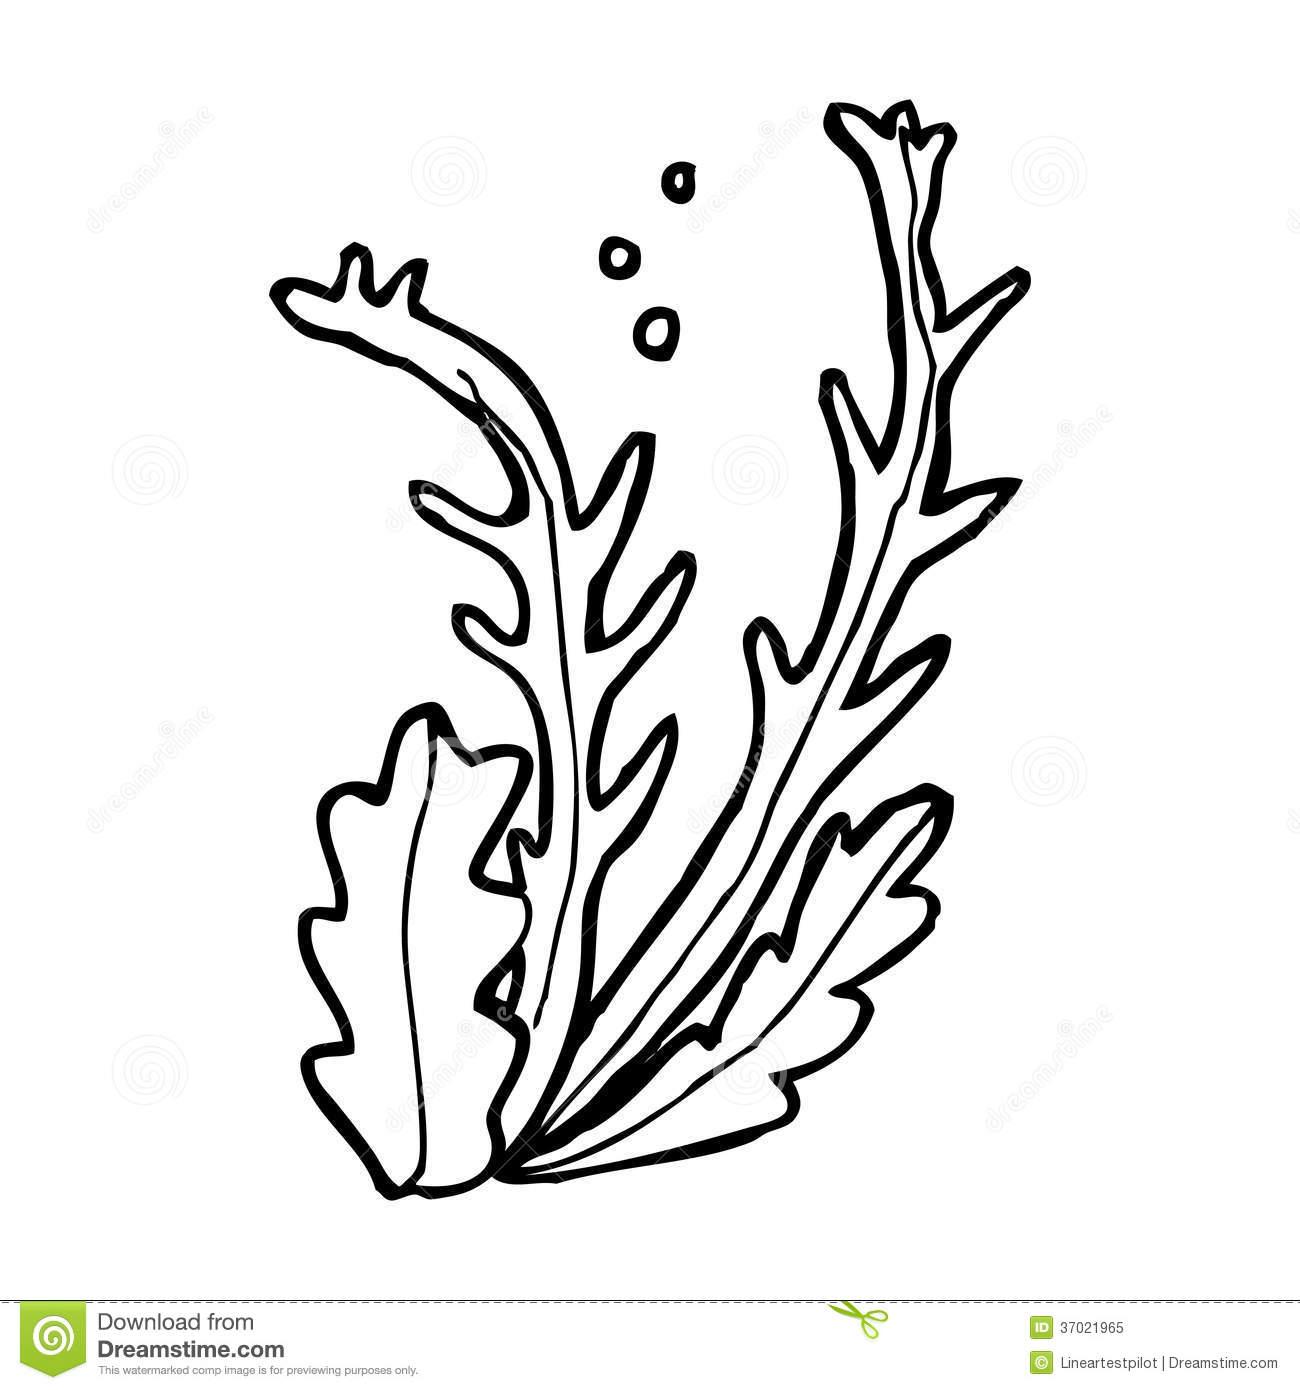 Algae Clipart Black And White Algae Black And White